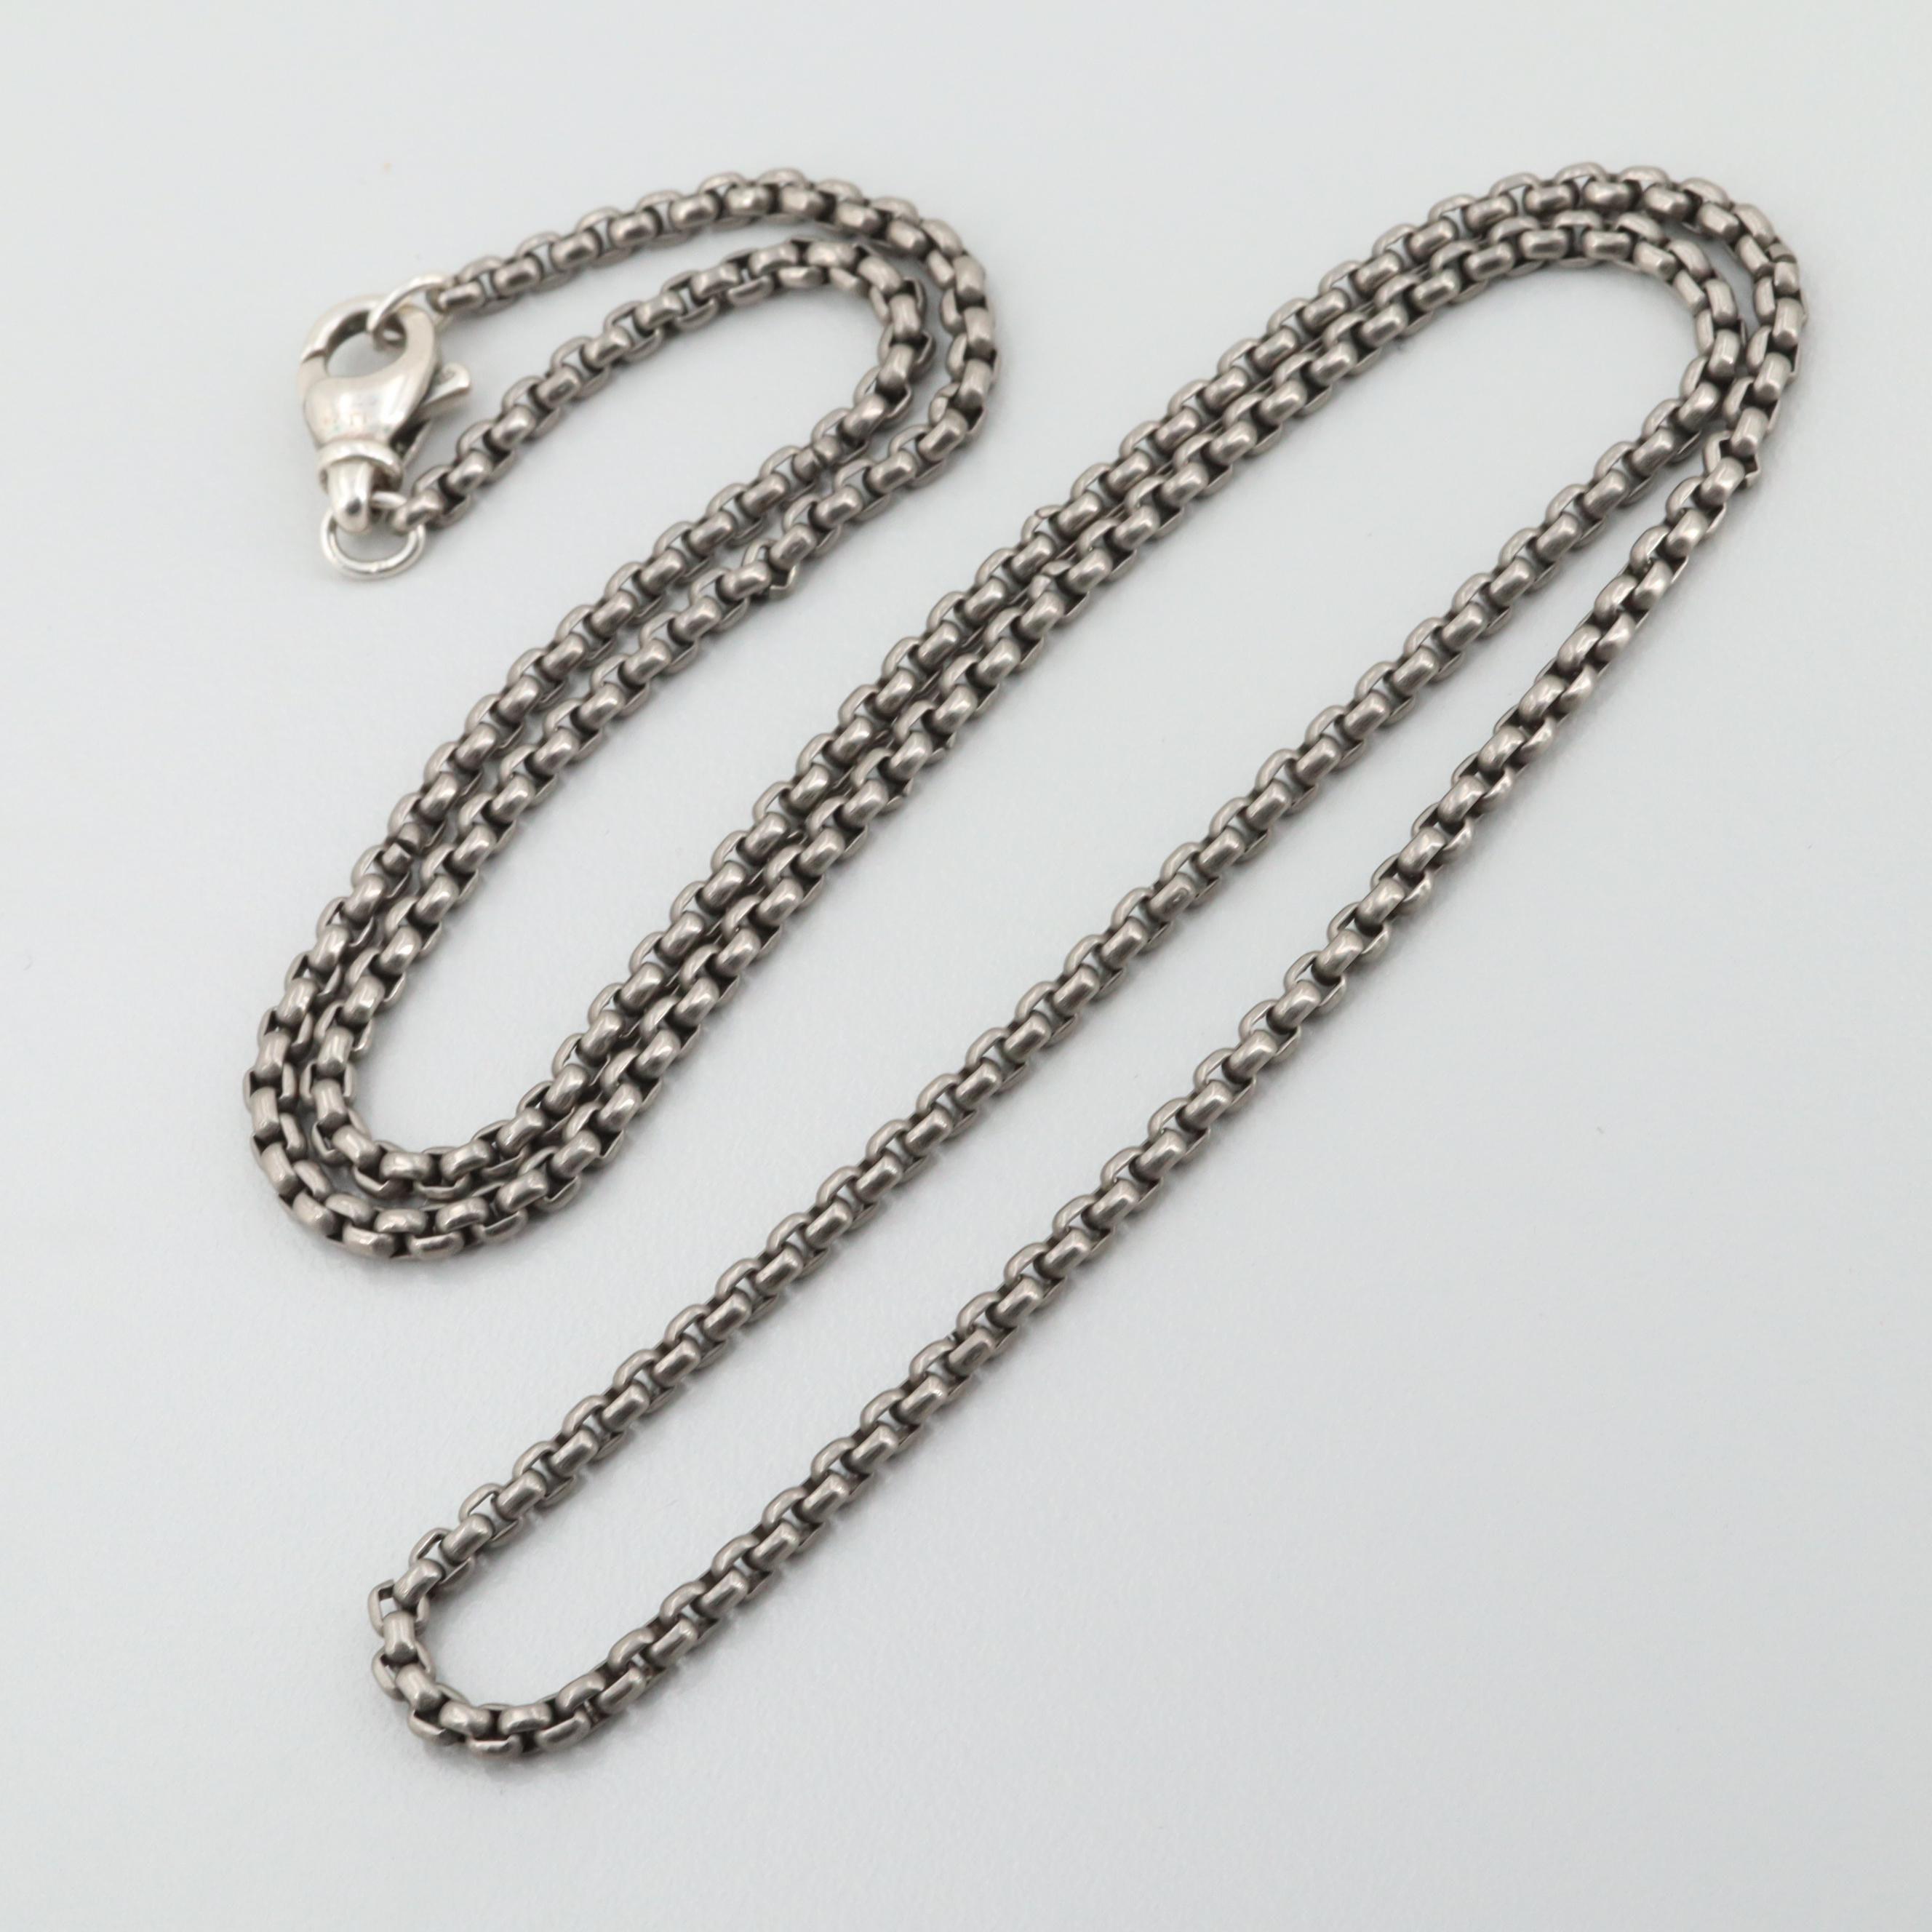 David Yurman Titanium Box Chain Necklace